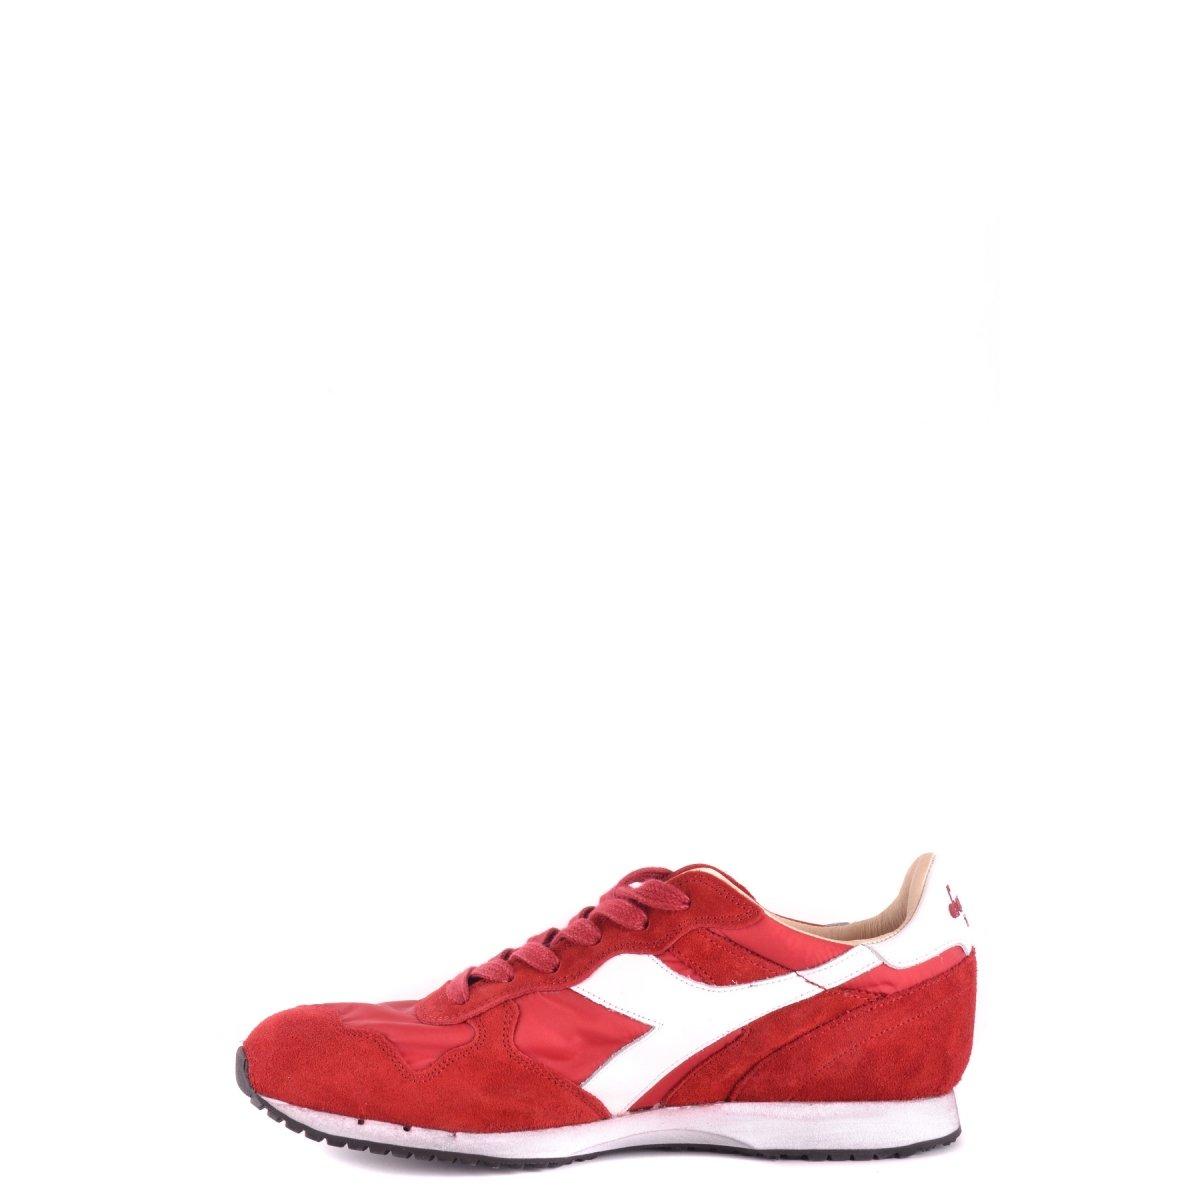 Diadora Uomo 157083 C6673 Sneakers Rosso-Bianco Camoscio-Nylon Spring-Summer 2017 UubvBD